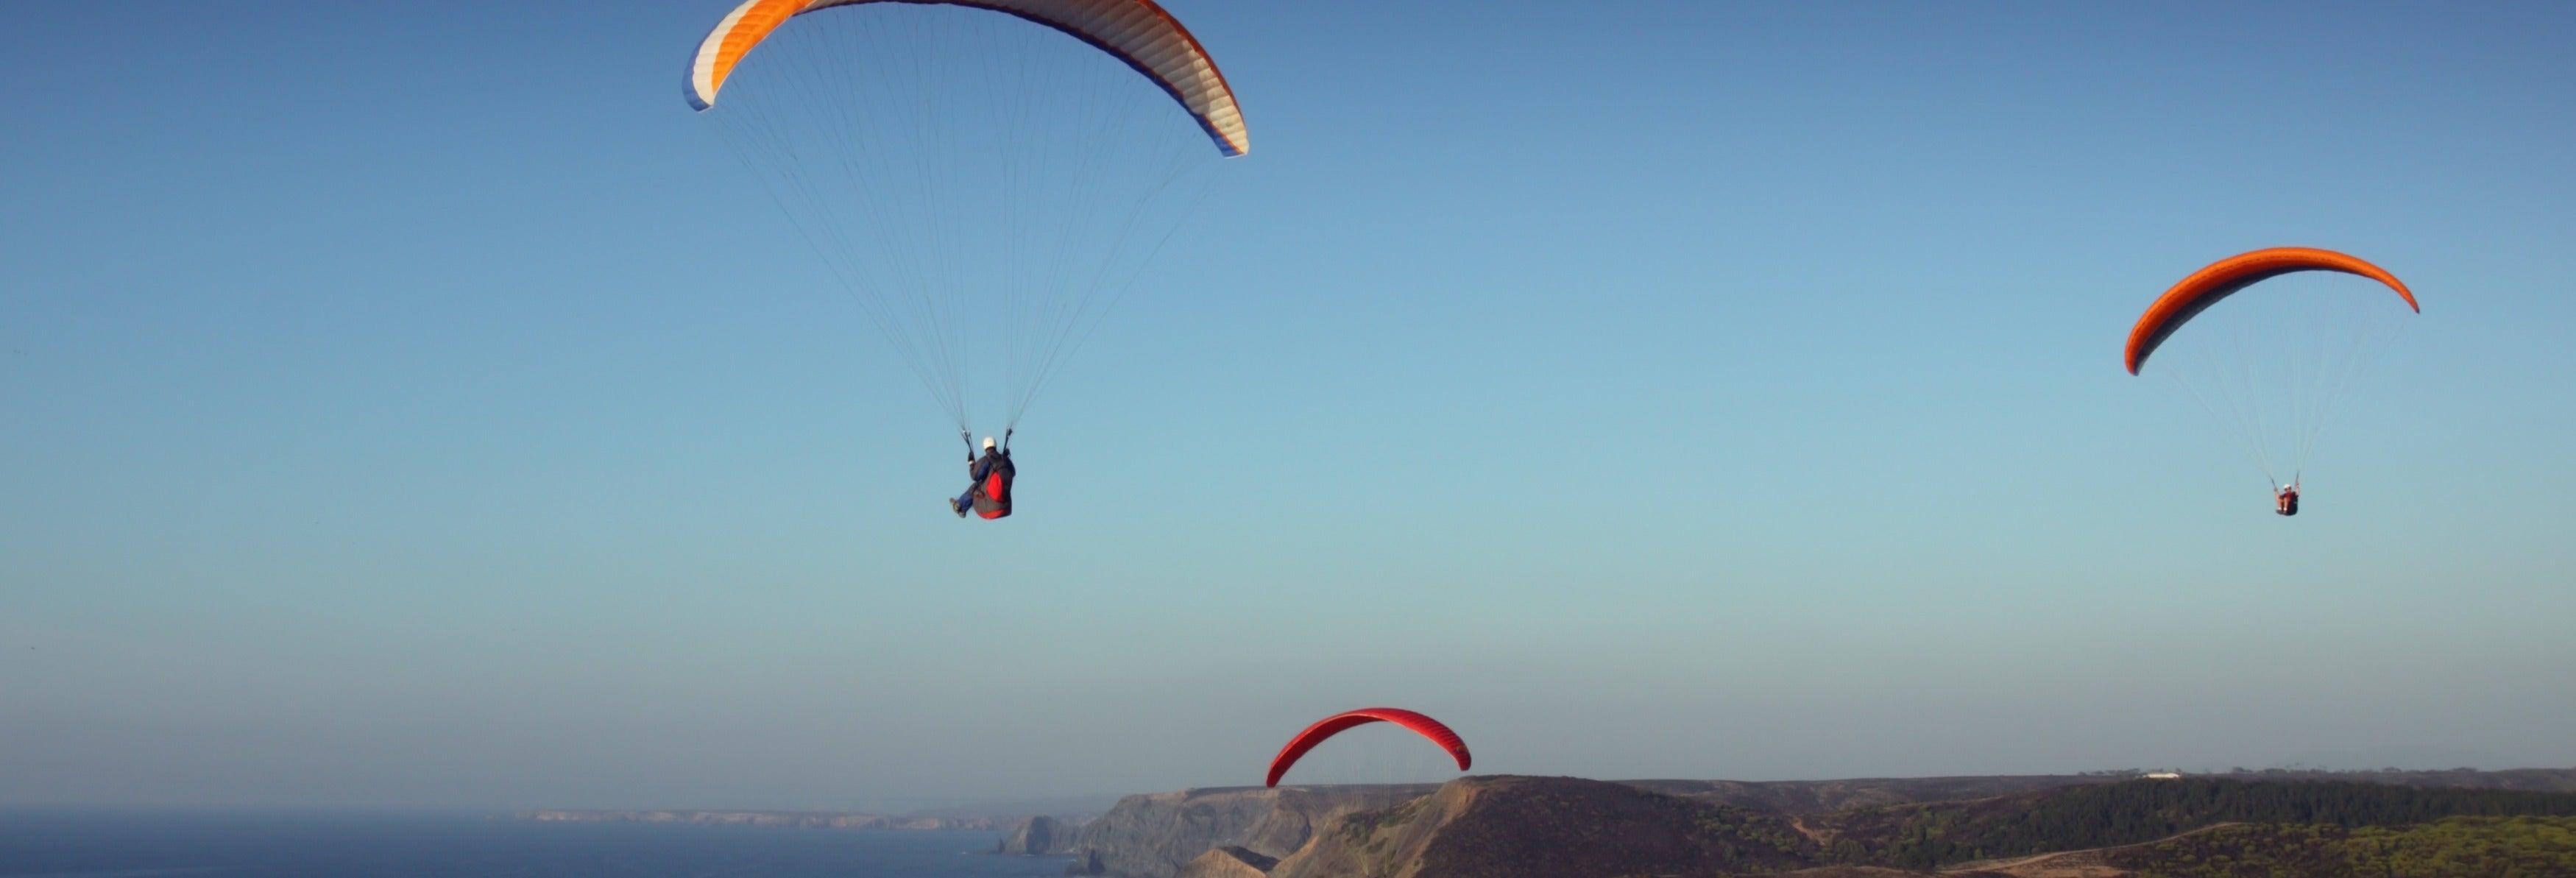 Paragliding in Lagos